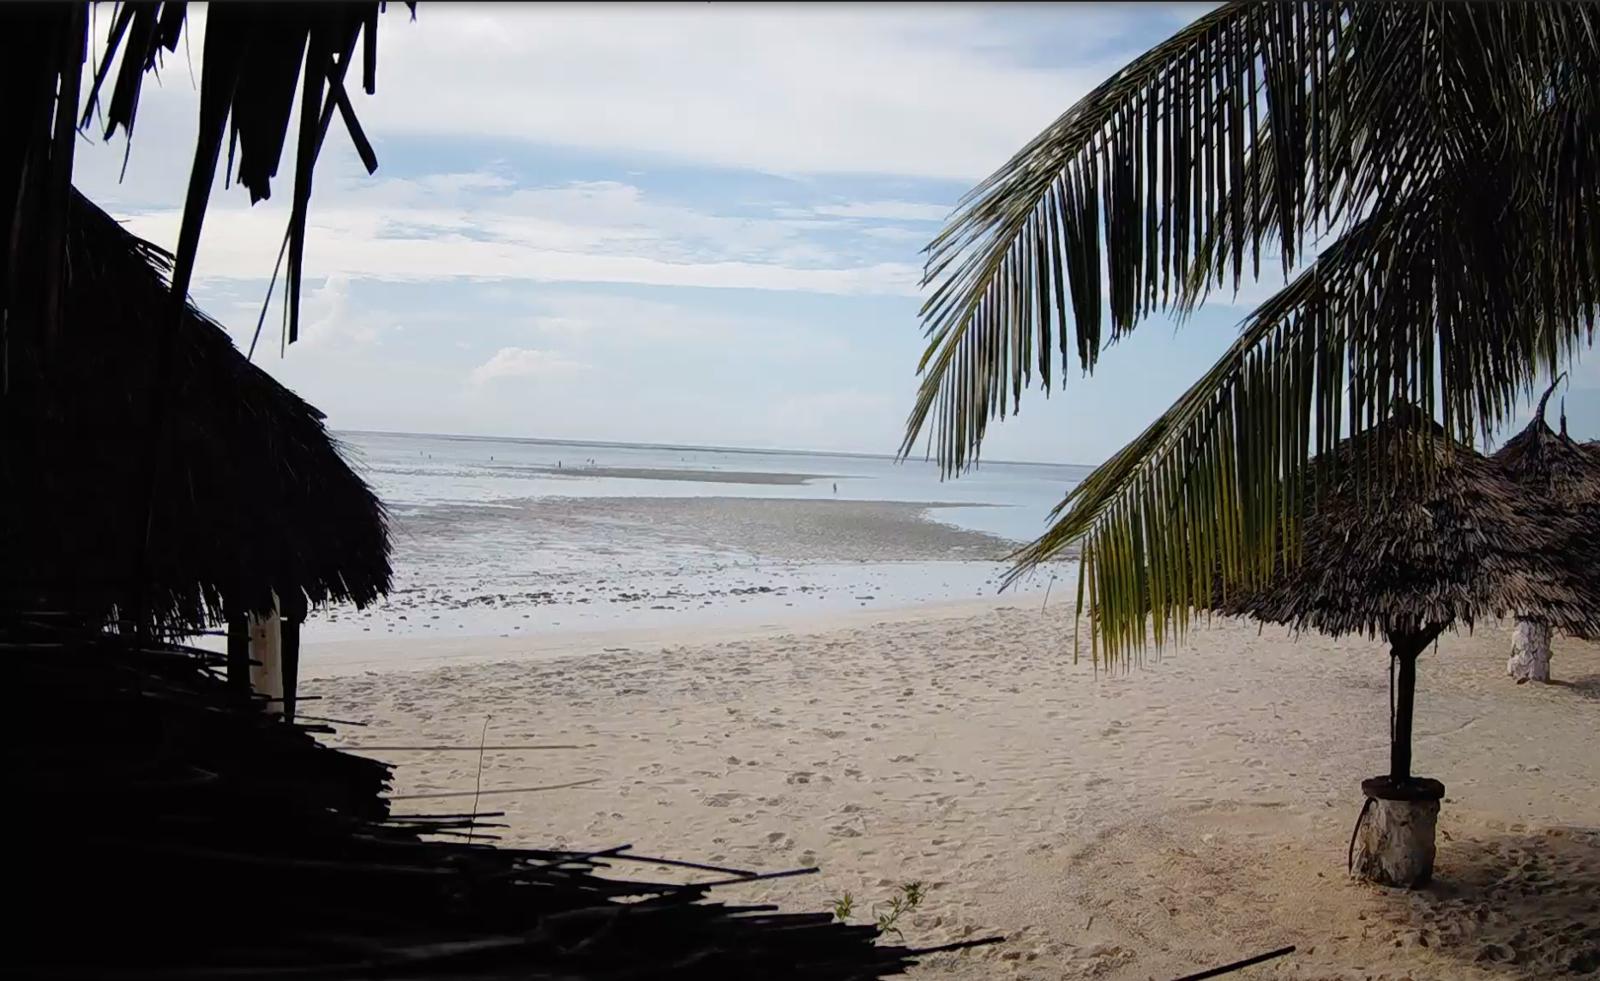 A Zanzibar, ce mardi 21 avril, depuis mon fauteuil de confiné...